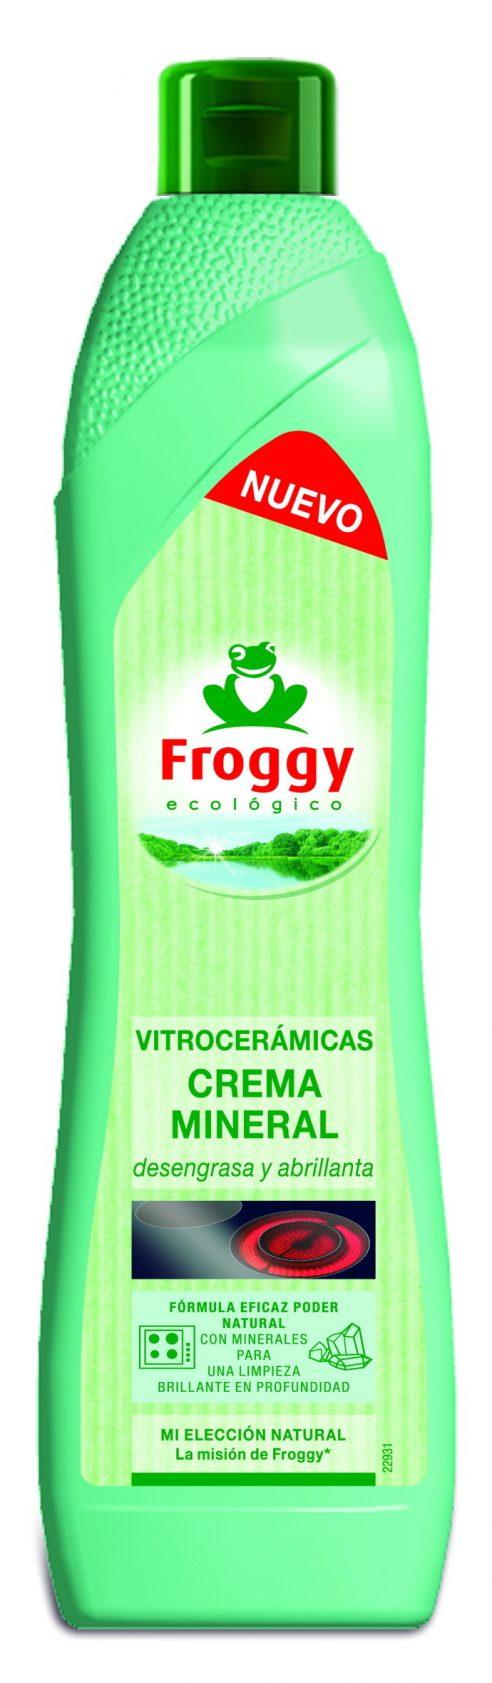 crema-vitro-vegana-eco